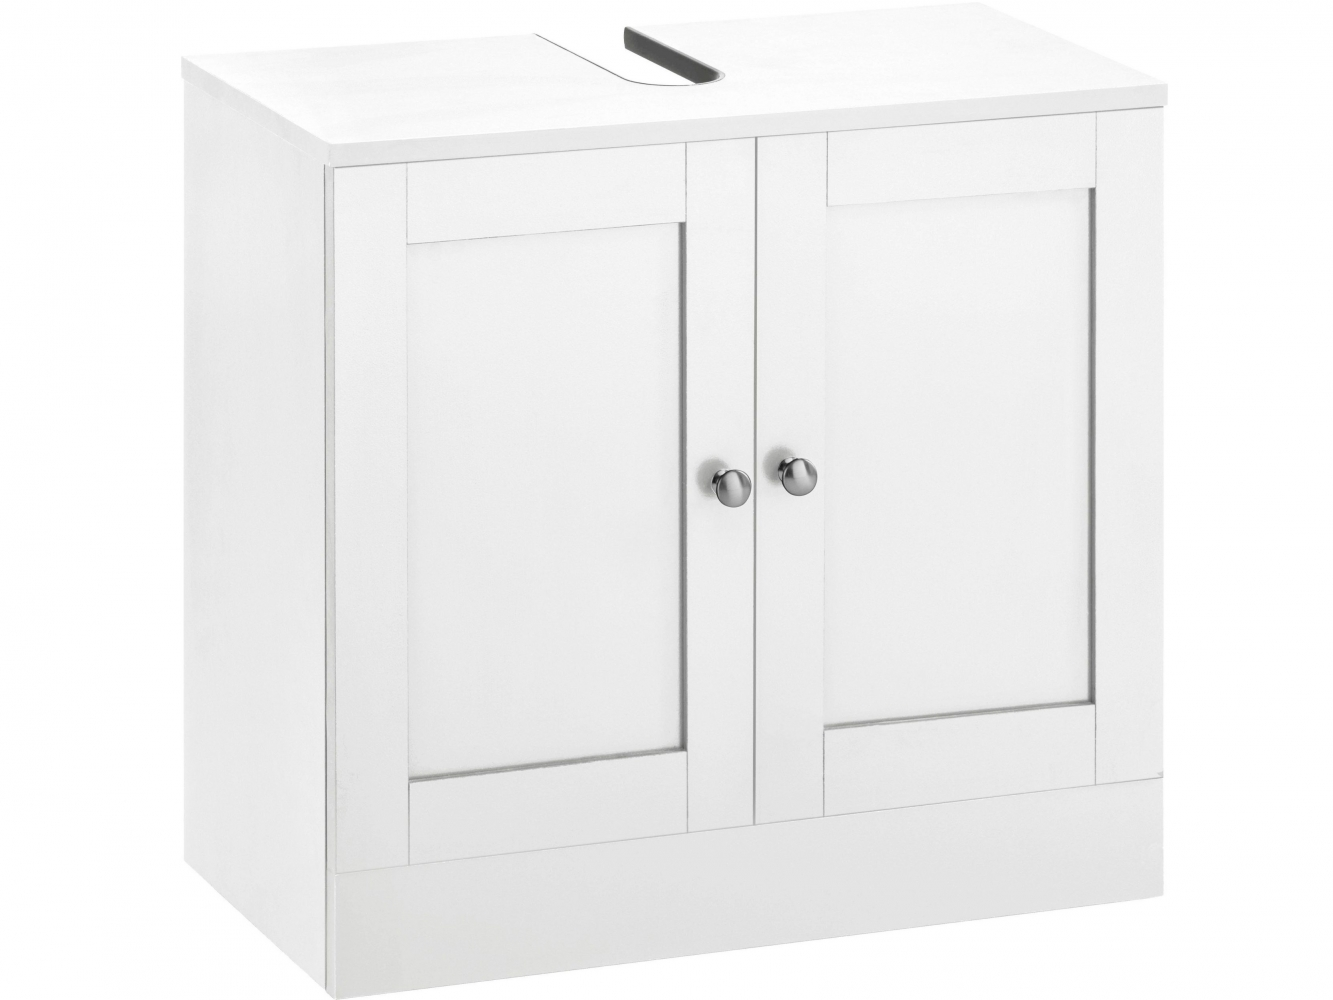 Umyvadlová skříňka Kiley II., 60 cm, bílá